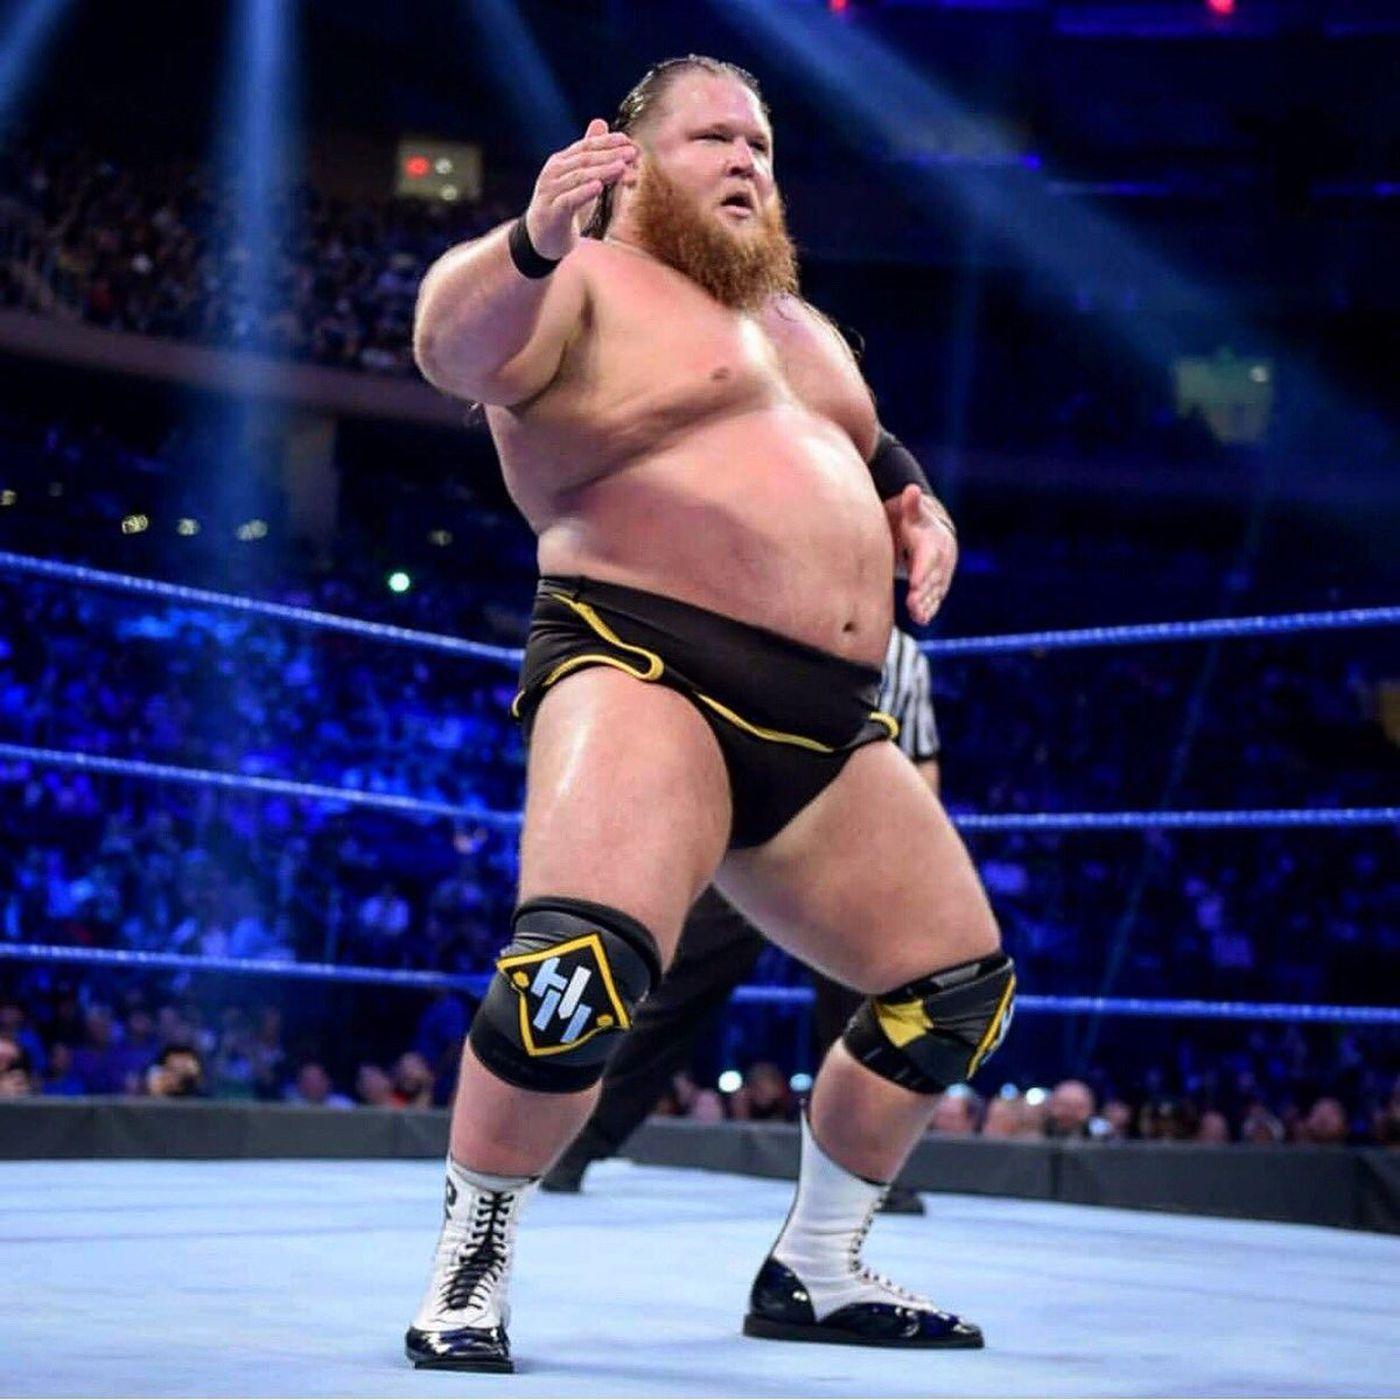 Wwe S Otis Is The Next Pro Wrestling Sweetheart Sbnation Com